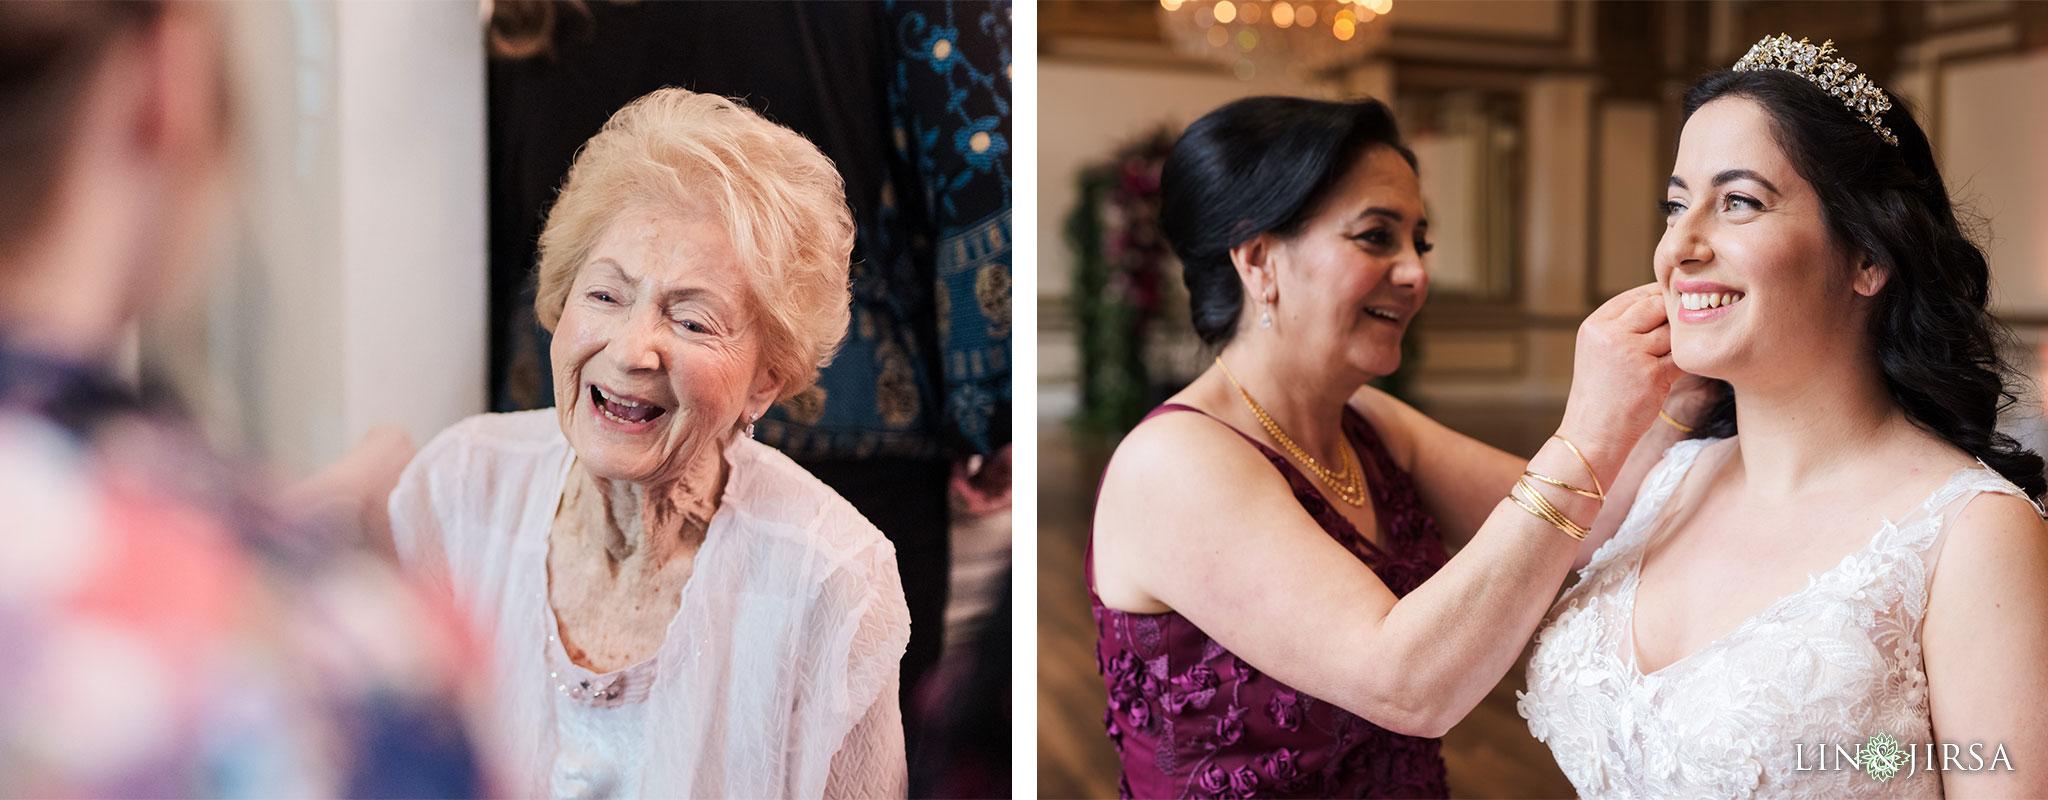 04 Alexandria Ballrooms Los Angeles Jewish Wedding Photography